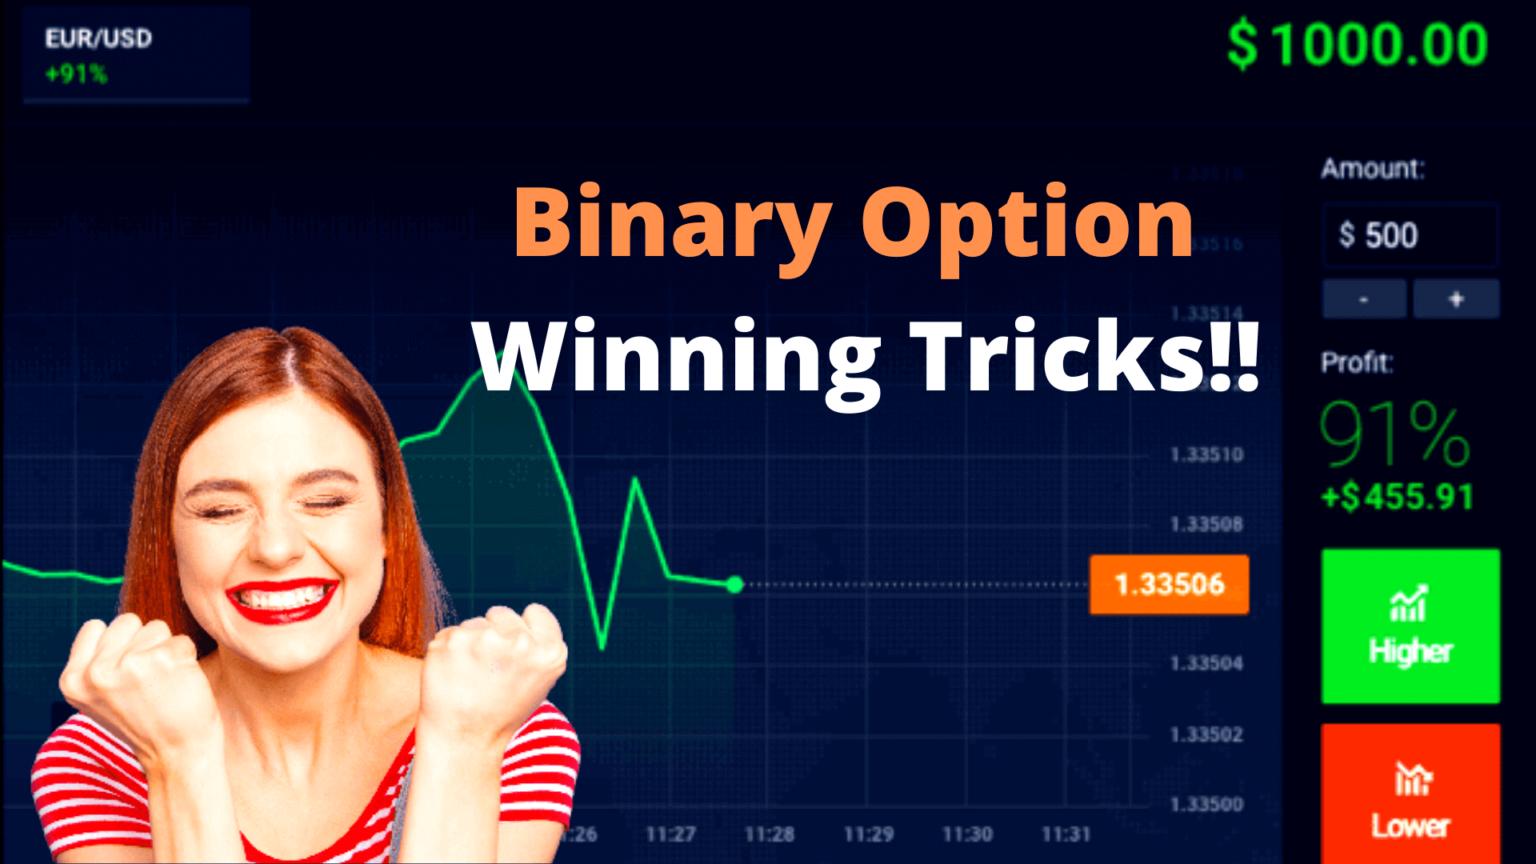 Learn Binary Option Winning Tricks